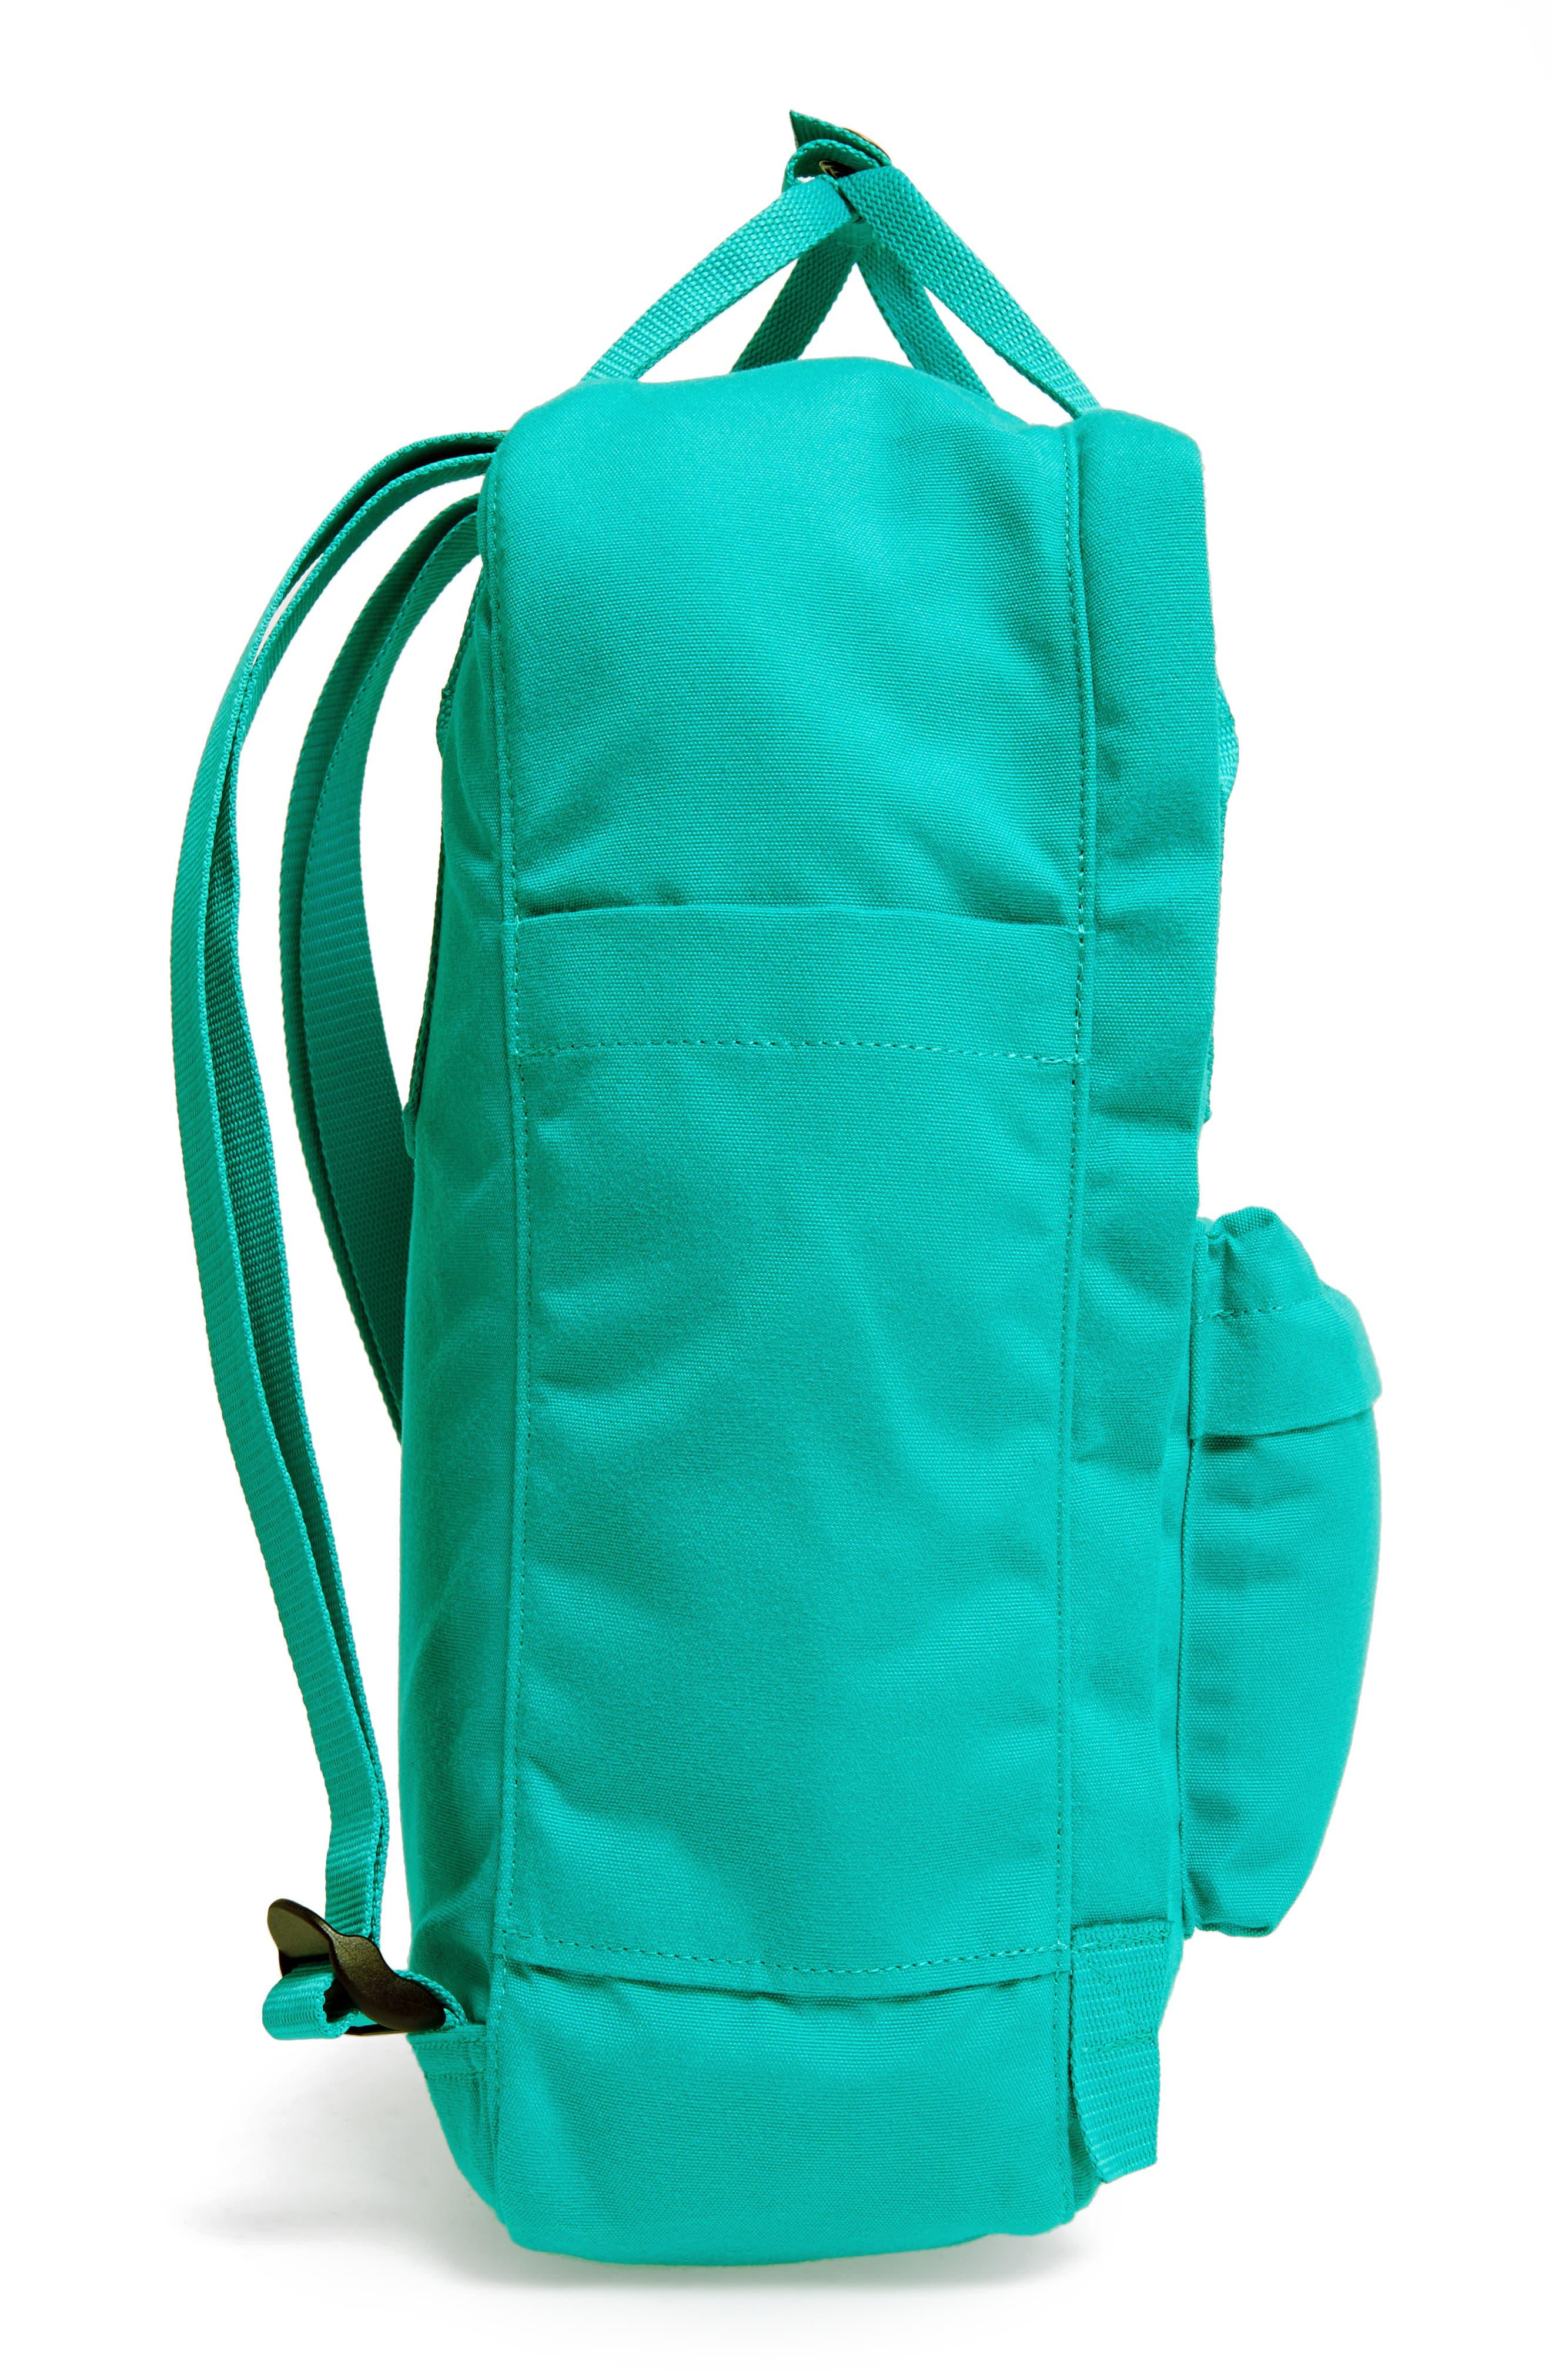 Re-Kånken Water Resistant Backpack,                             Alternate thumbnail 5, color,                             EMERALD